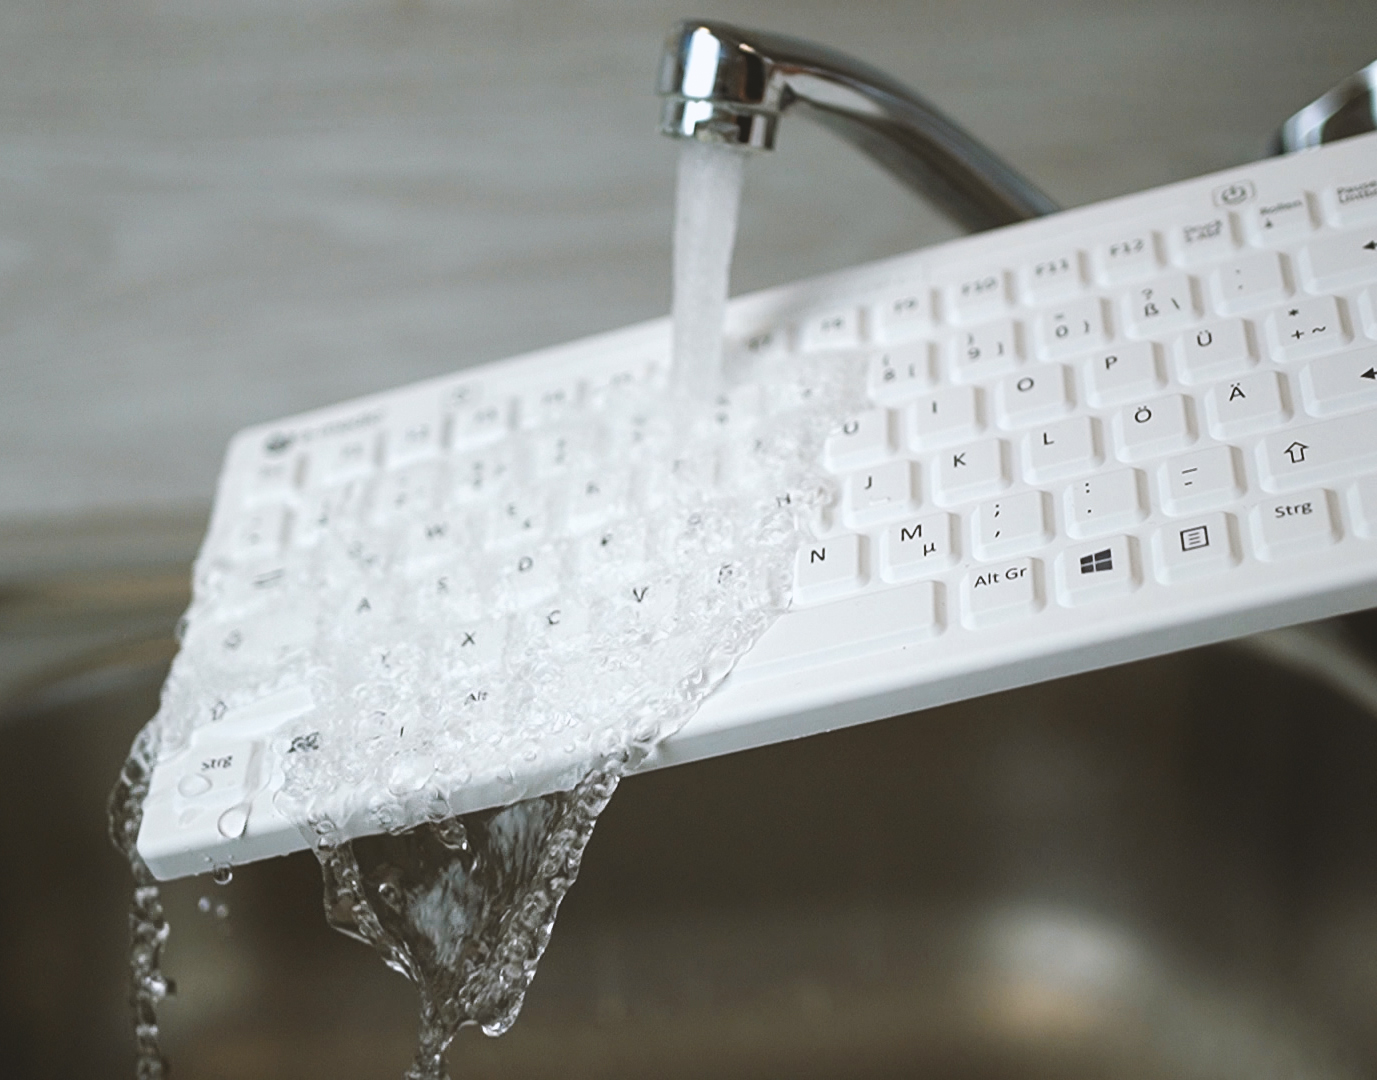 abwaschbare-medizinische-silikon-tastatur-e-medic